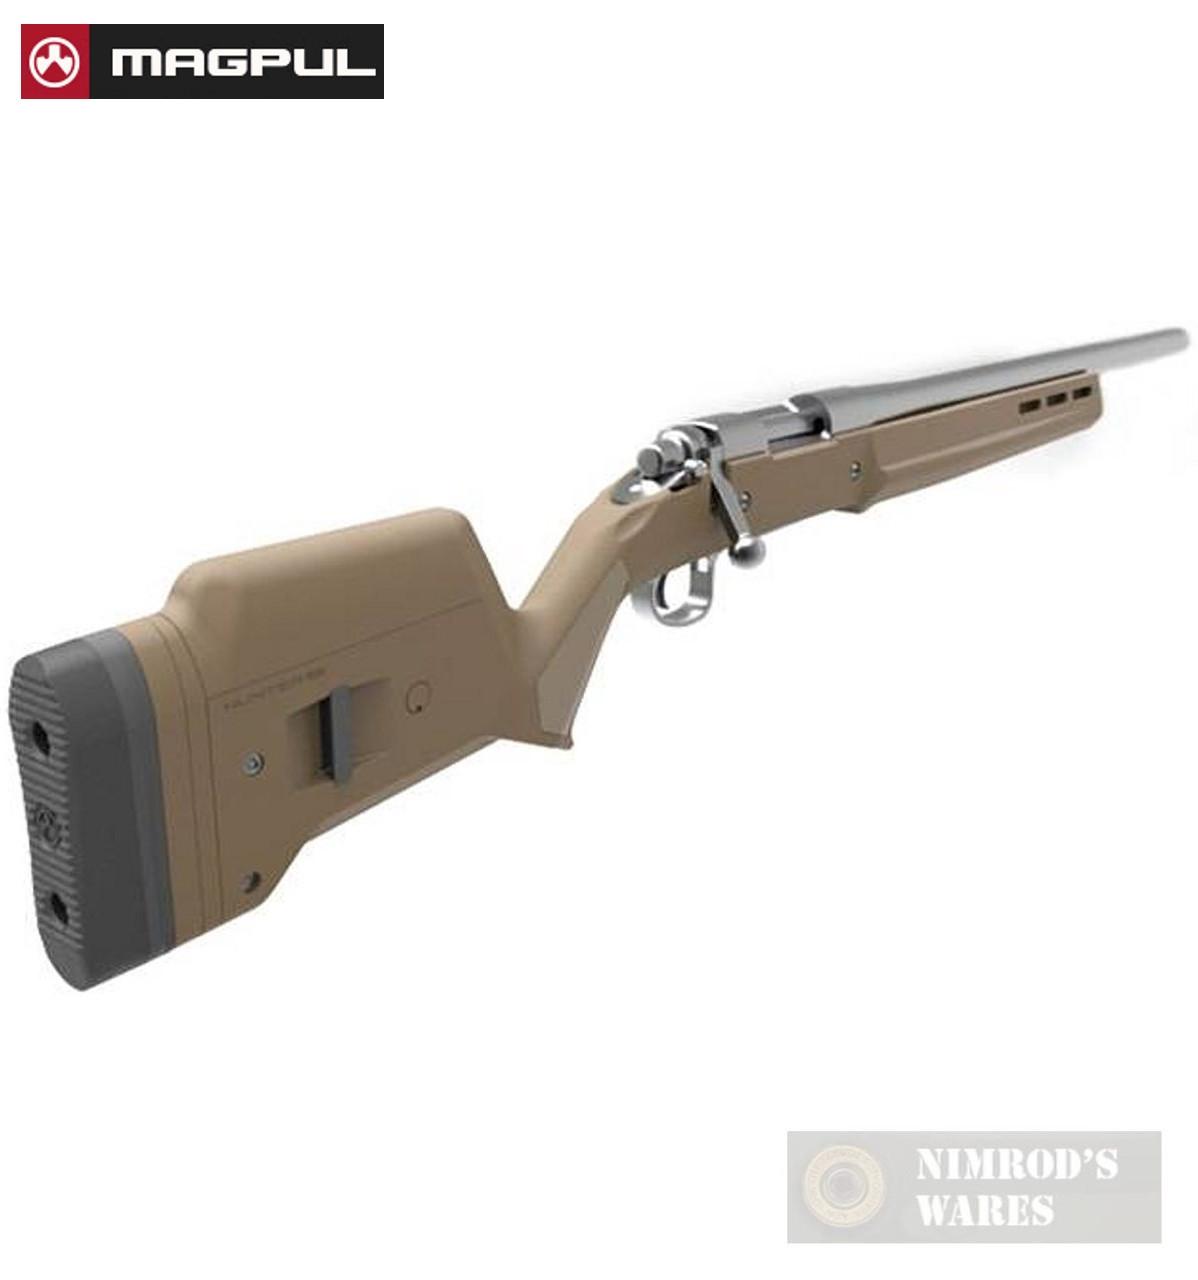 Magpul Hunter 700 Stock Black MAG495-BLK for Remington 700 Short Action